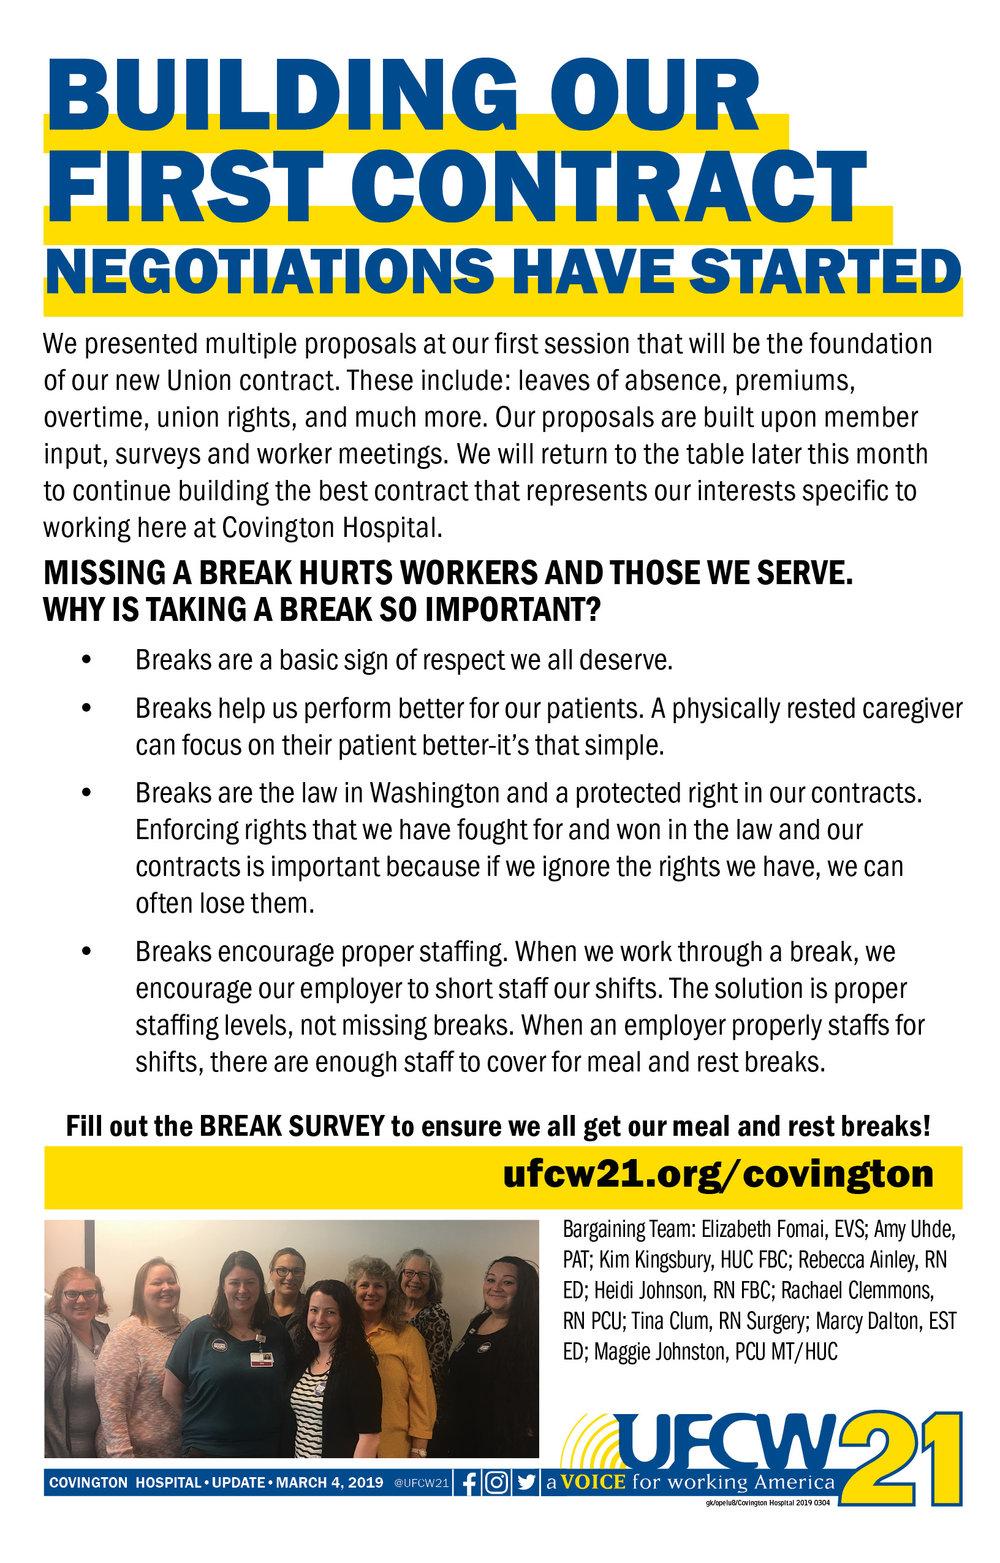 2019 0304 Covington Hospital update.jpg